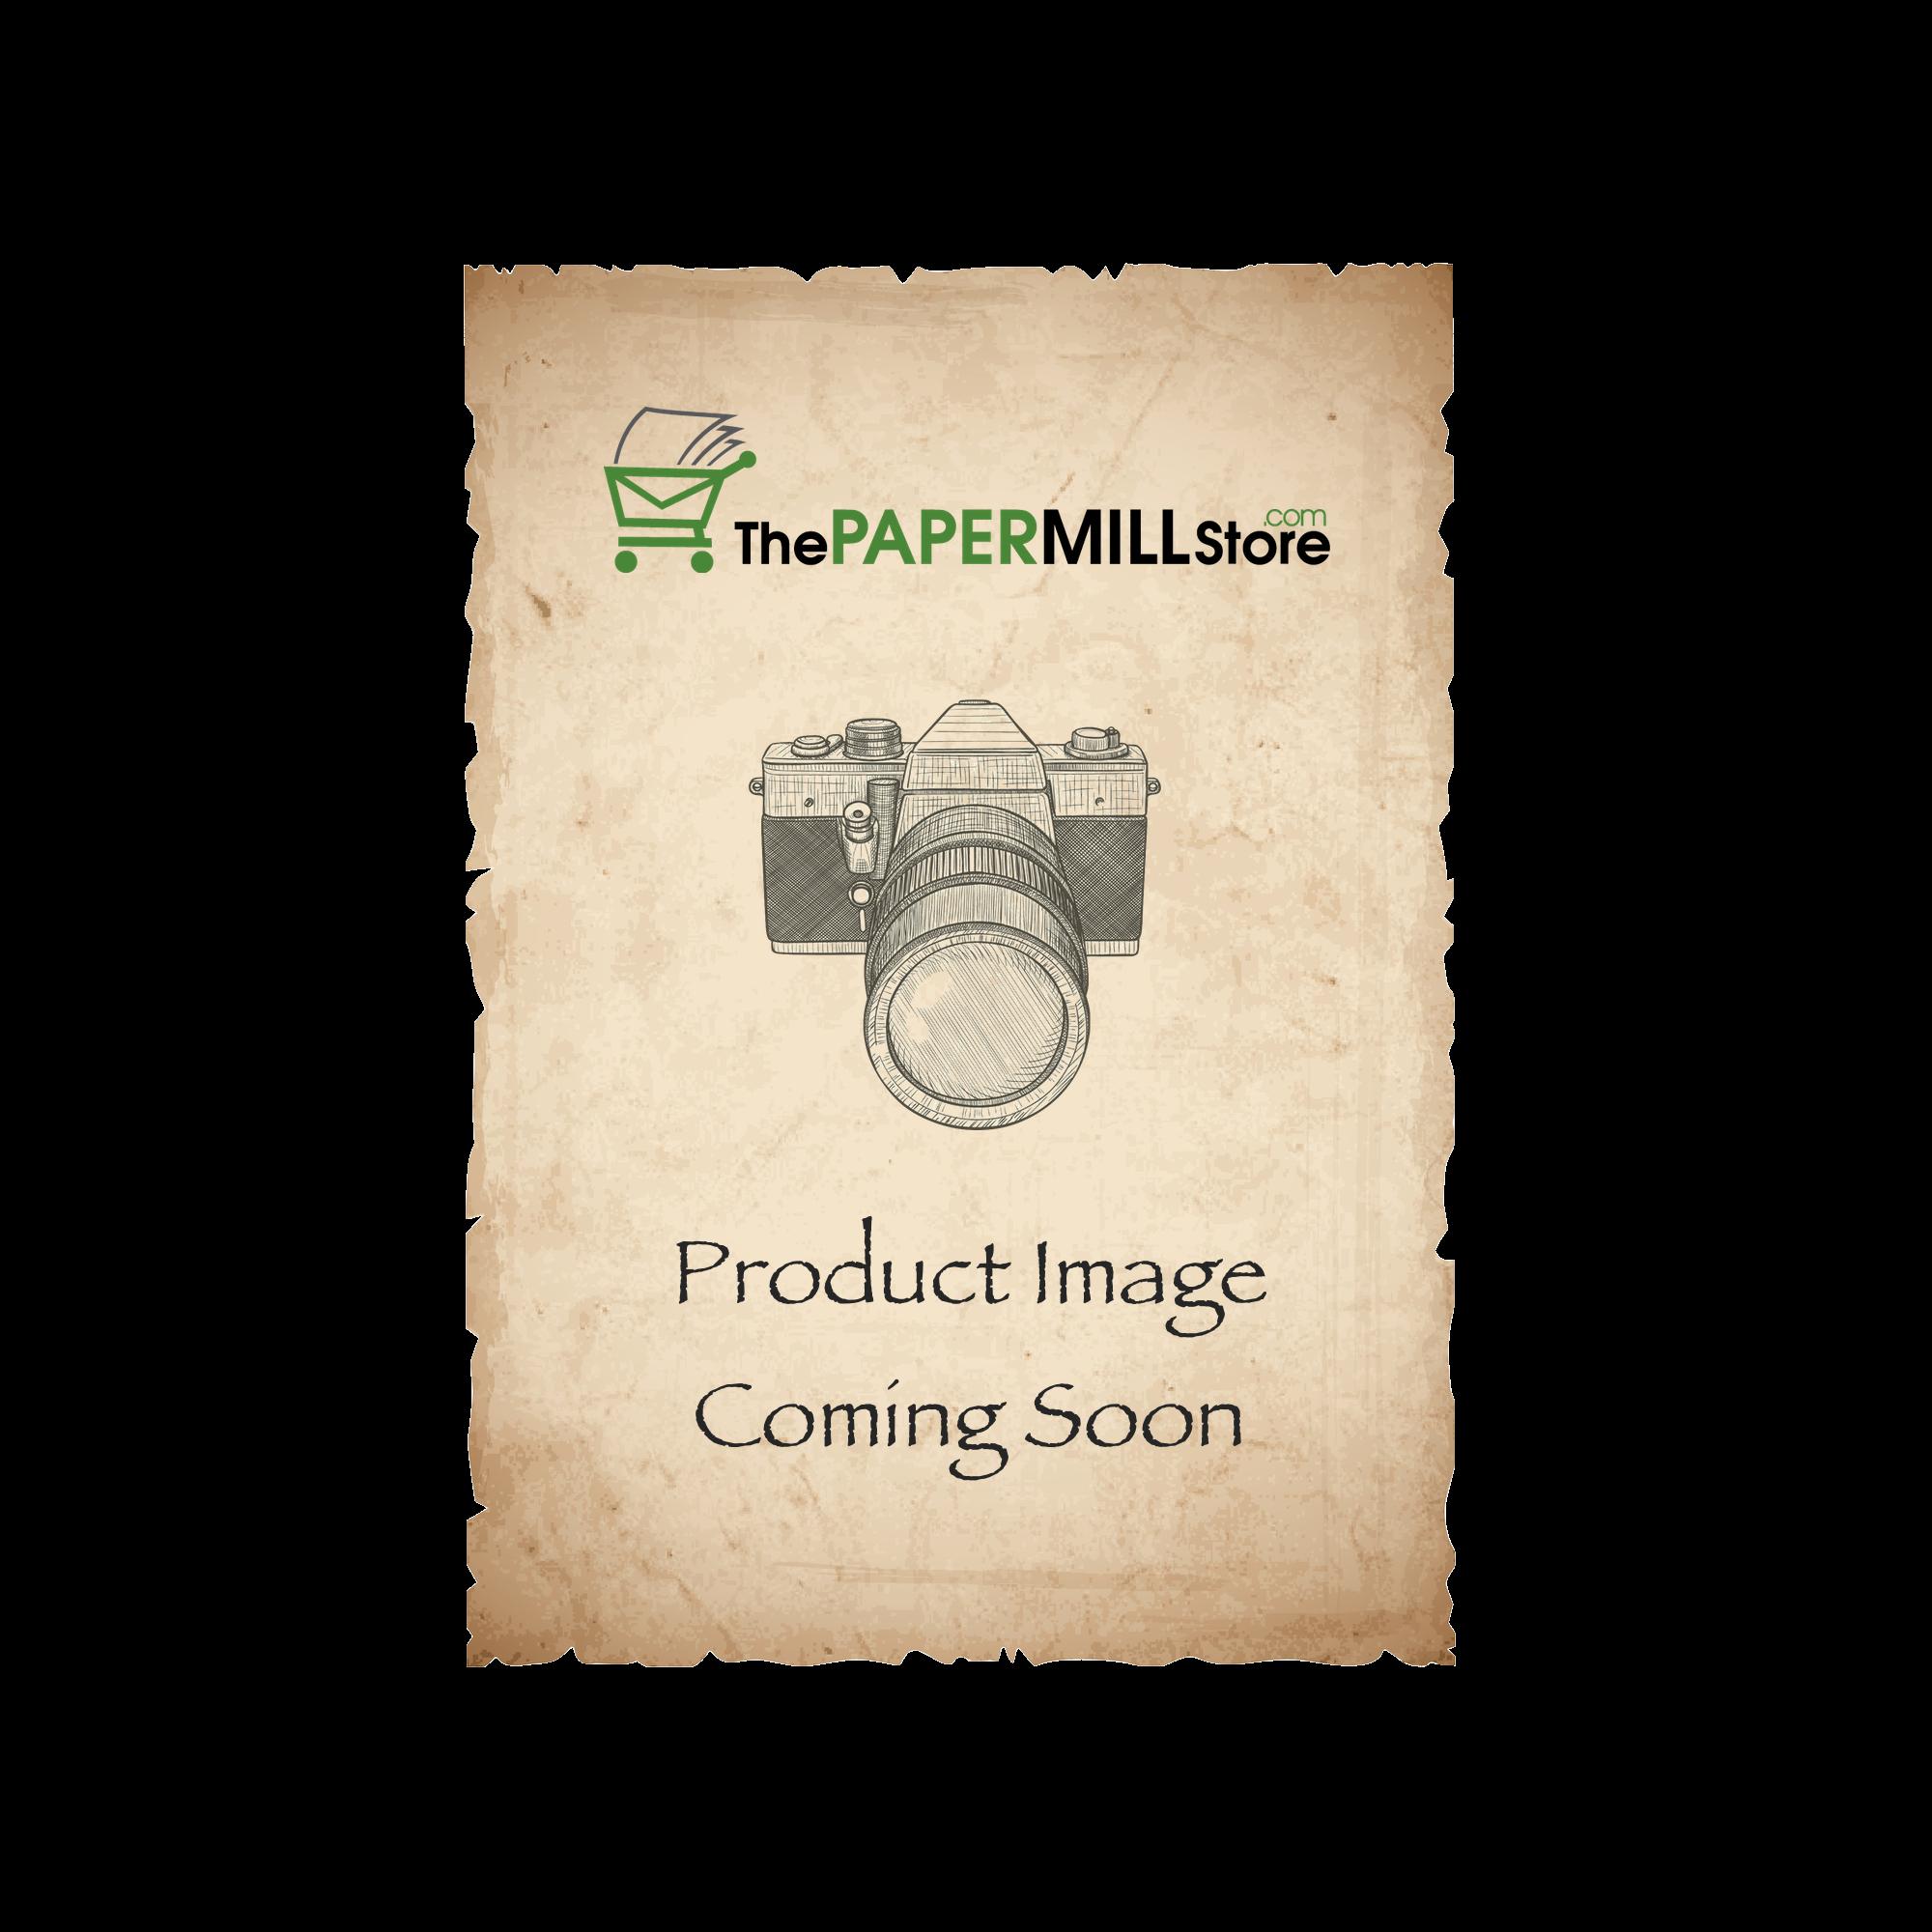 OXFORD Cream Envelopes - A2 (4 3/8 x 5 3/4) 80 lb Text Texture  30% Recycled 250 per Box